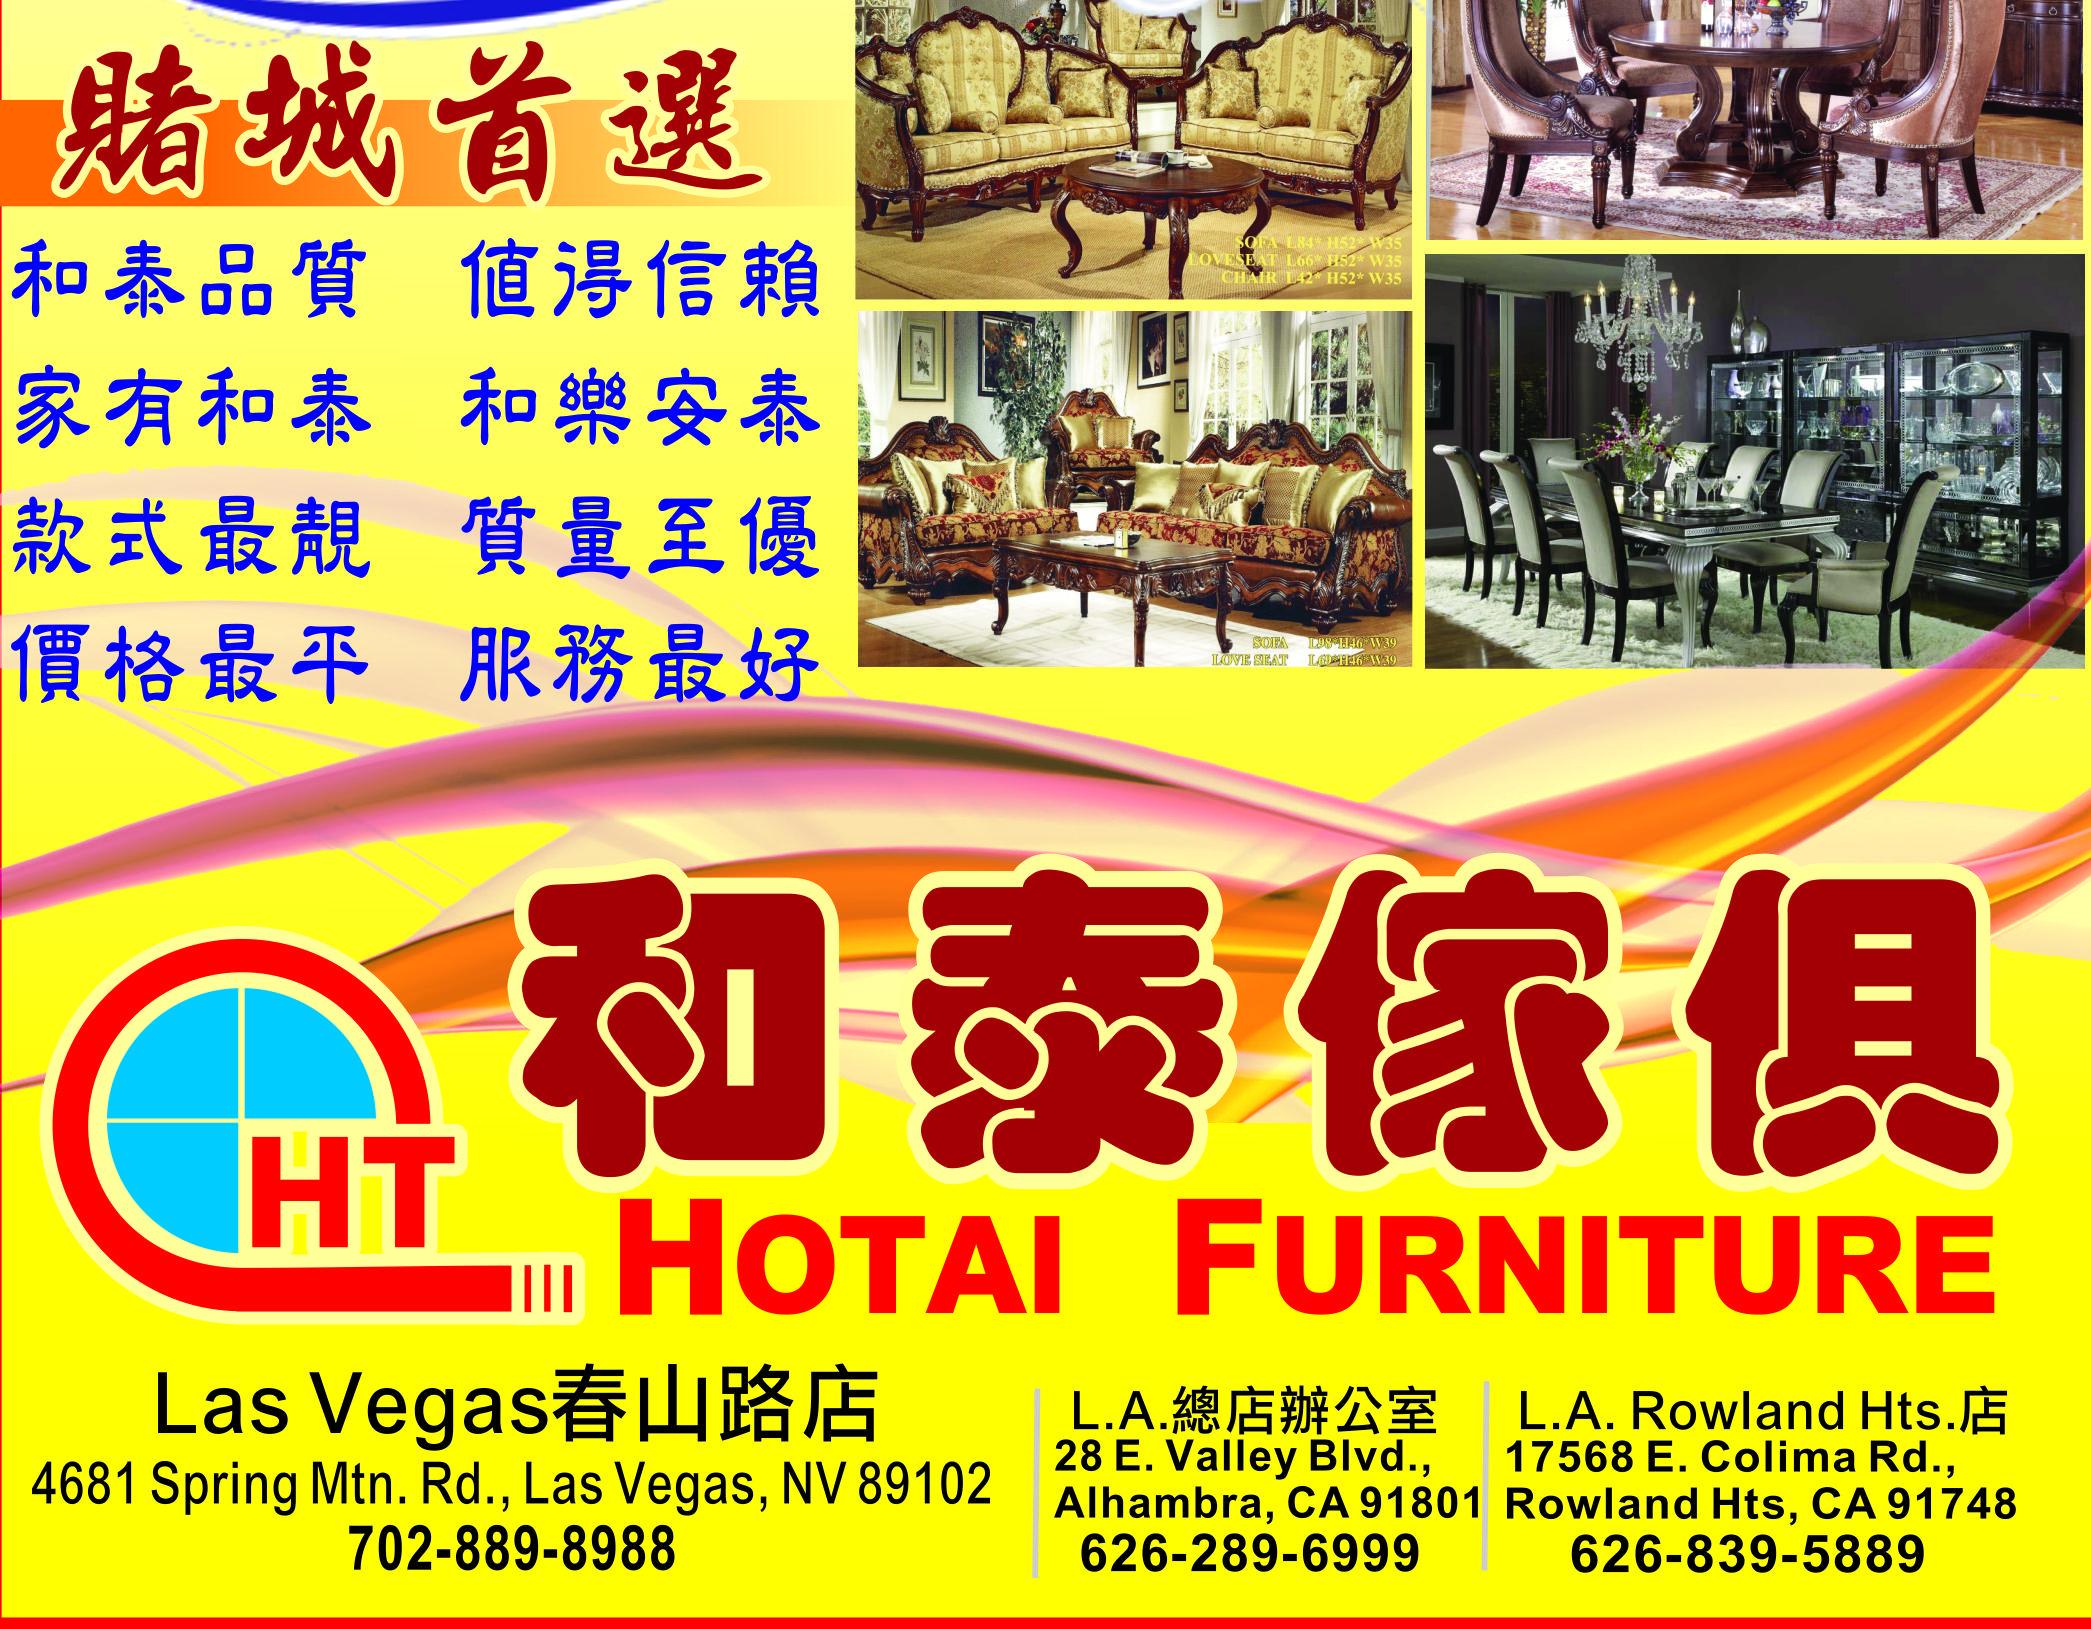 和泰家具 HoTai Furniture<